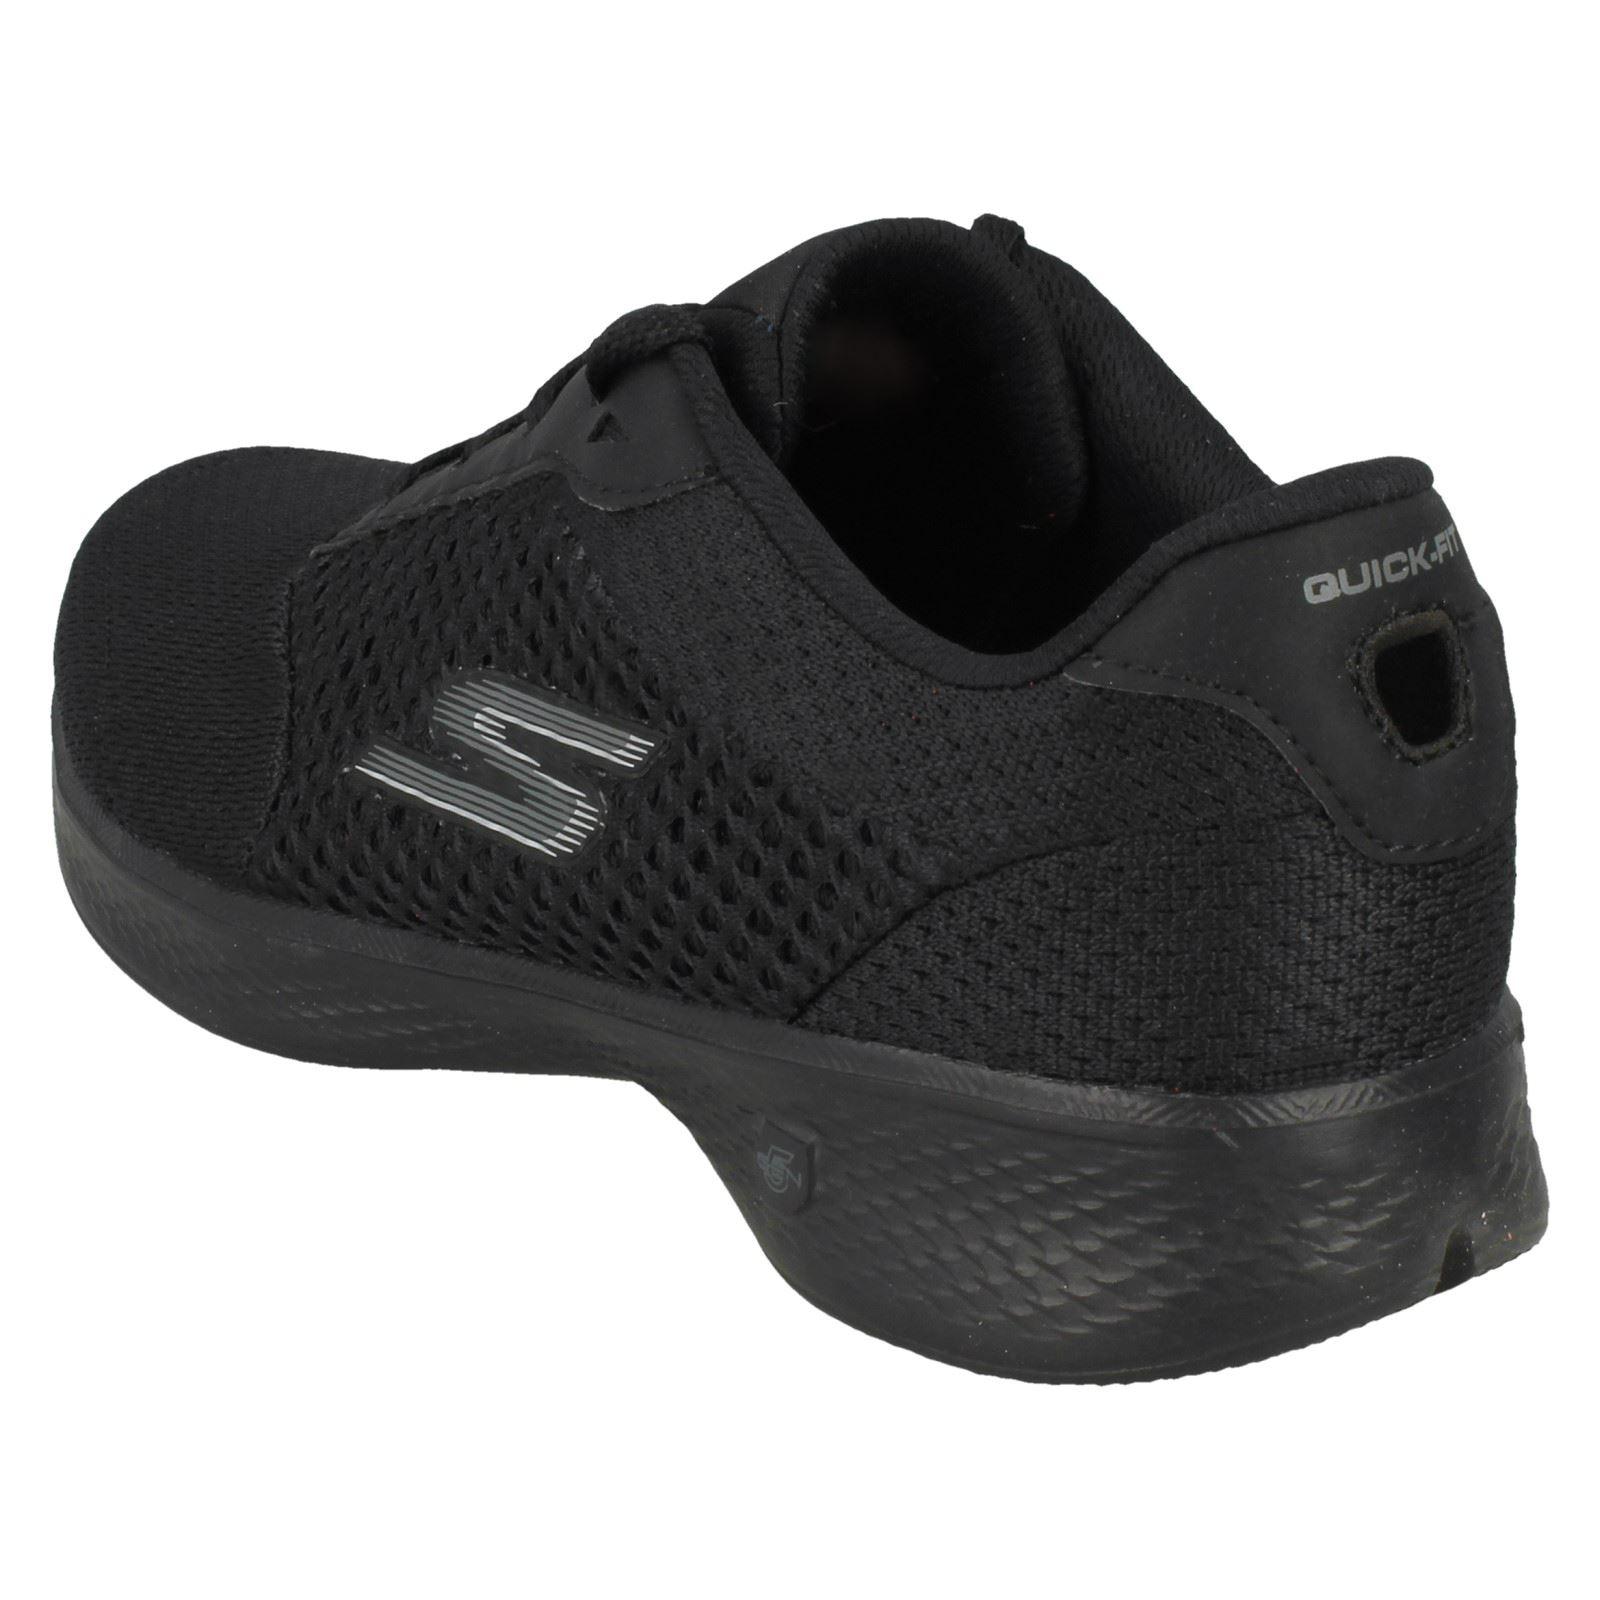 Donna Skechers's Sports Scarpe Da Ginnastica Go Go Go Walk 4 superare i 14146 - db5f8f